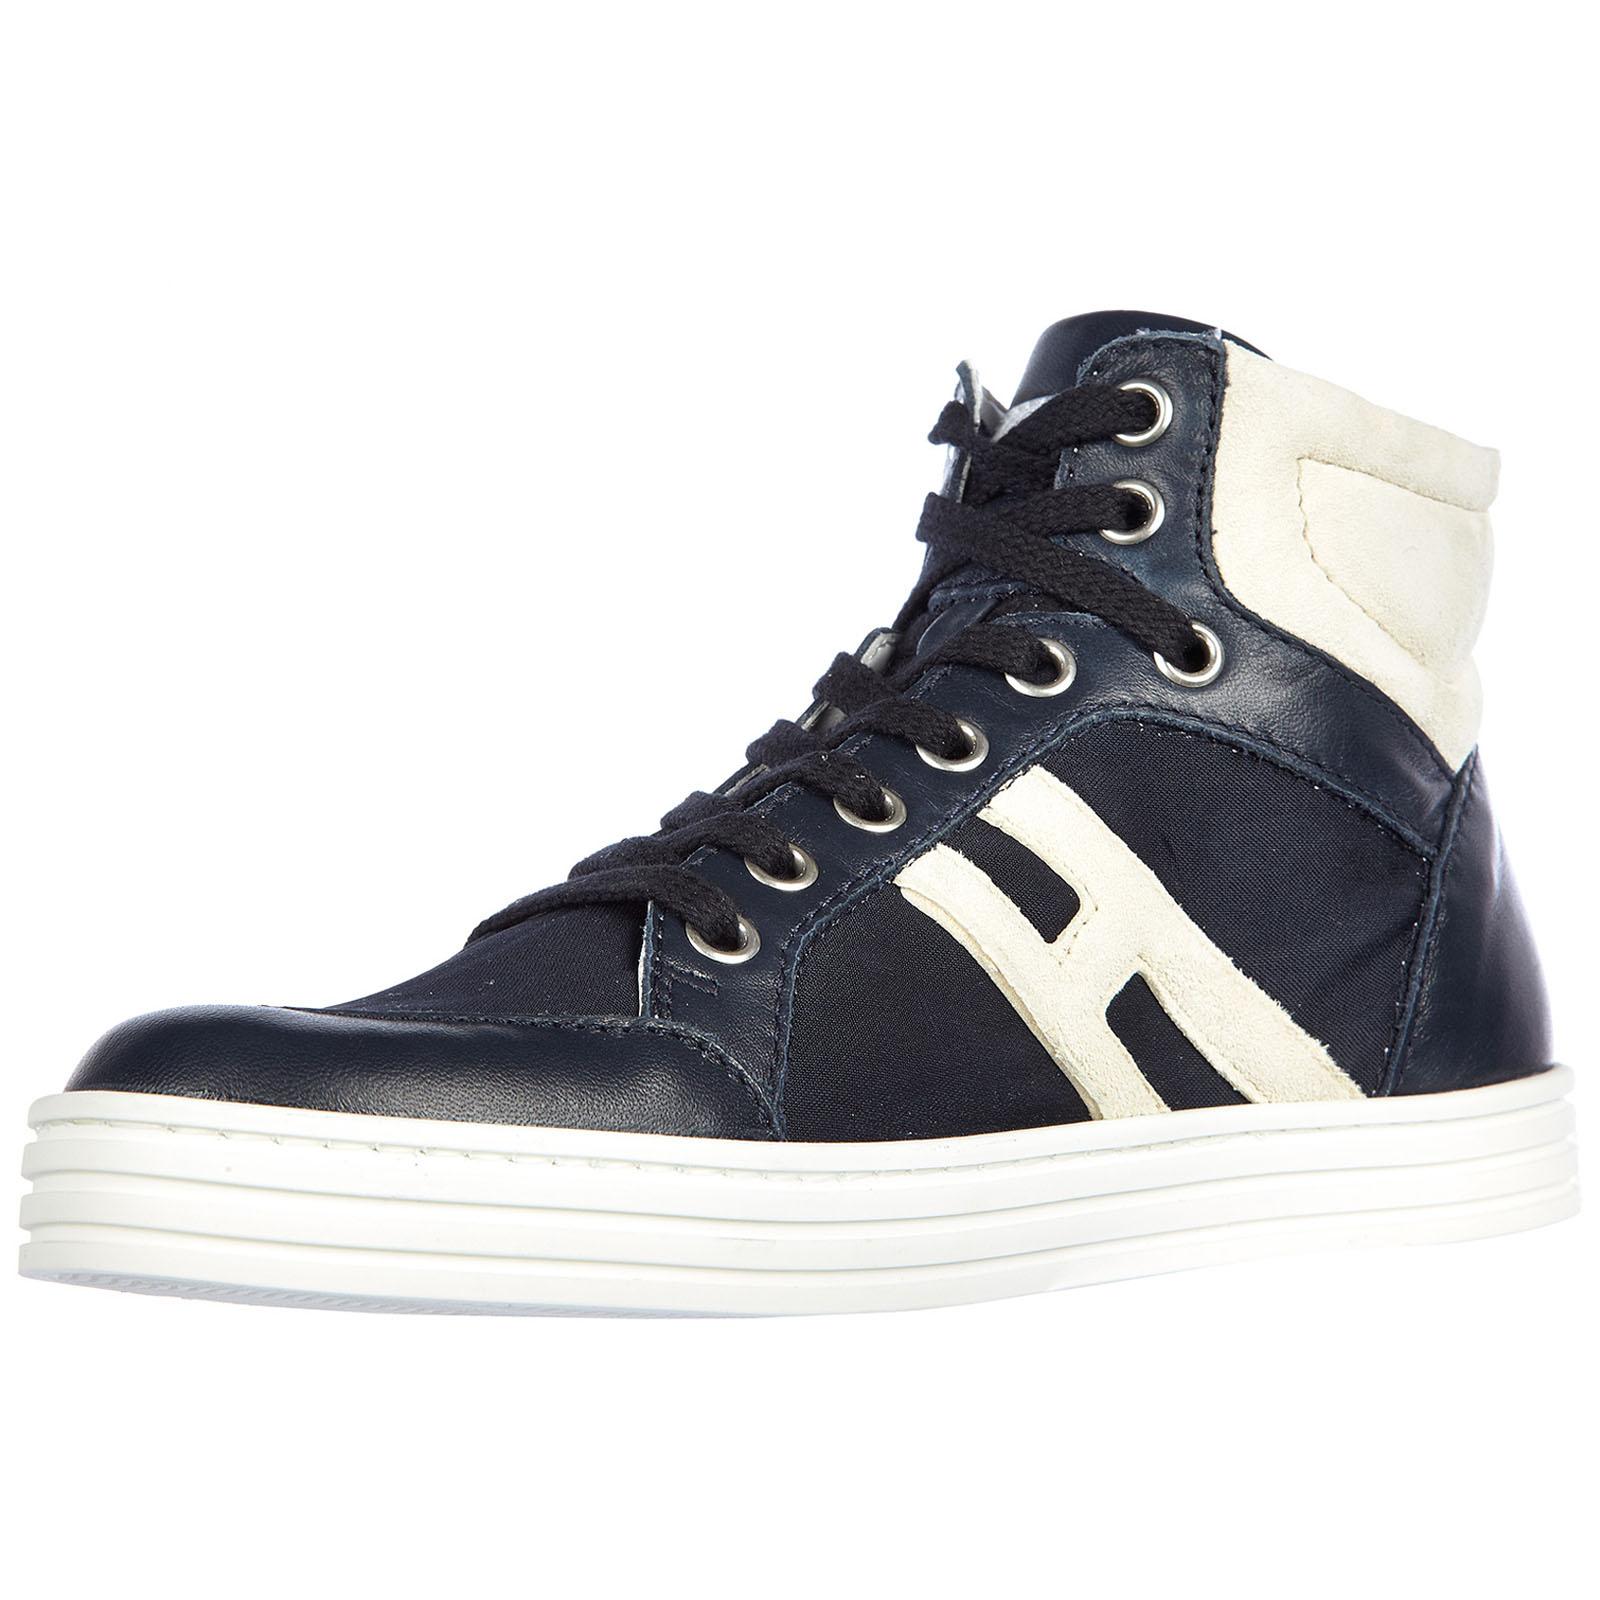 f6f5a1640aab0 ... Chaussures baskets sneakers enfant garçon pelle rebel polacco basket ...